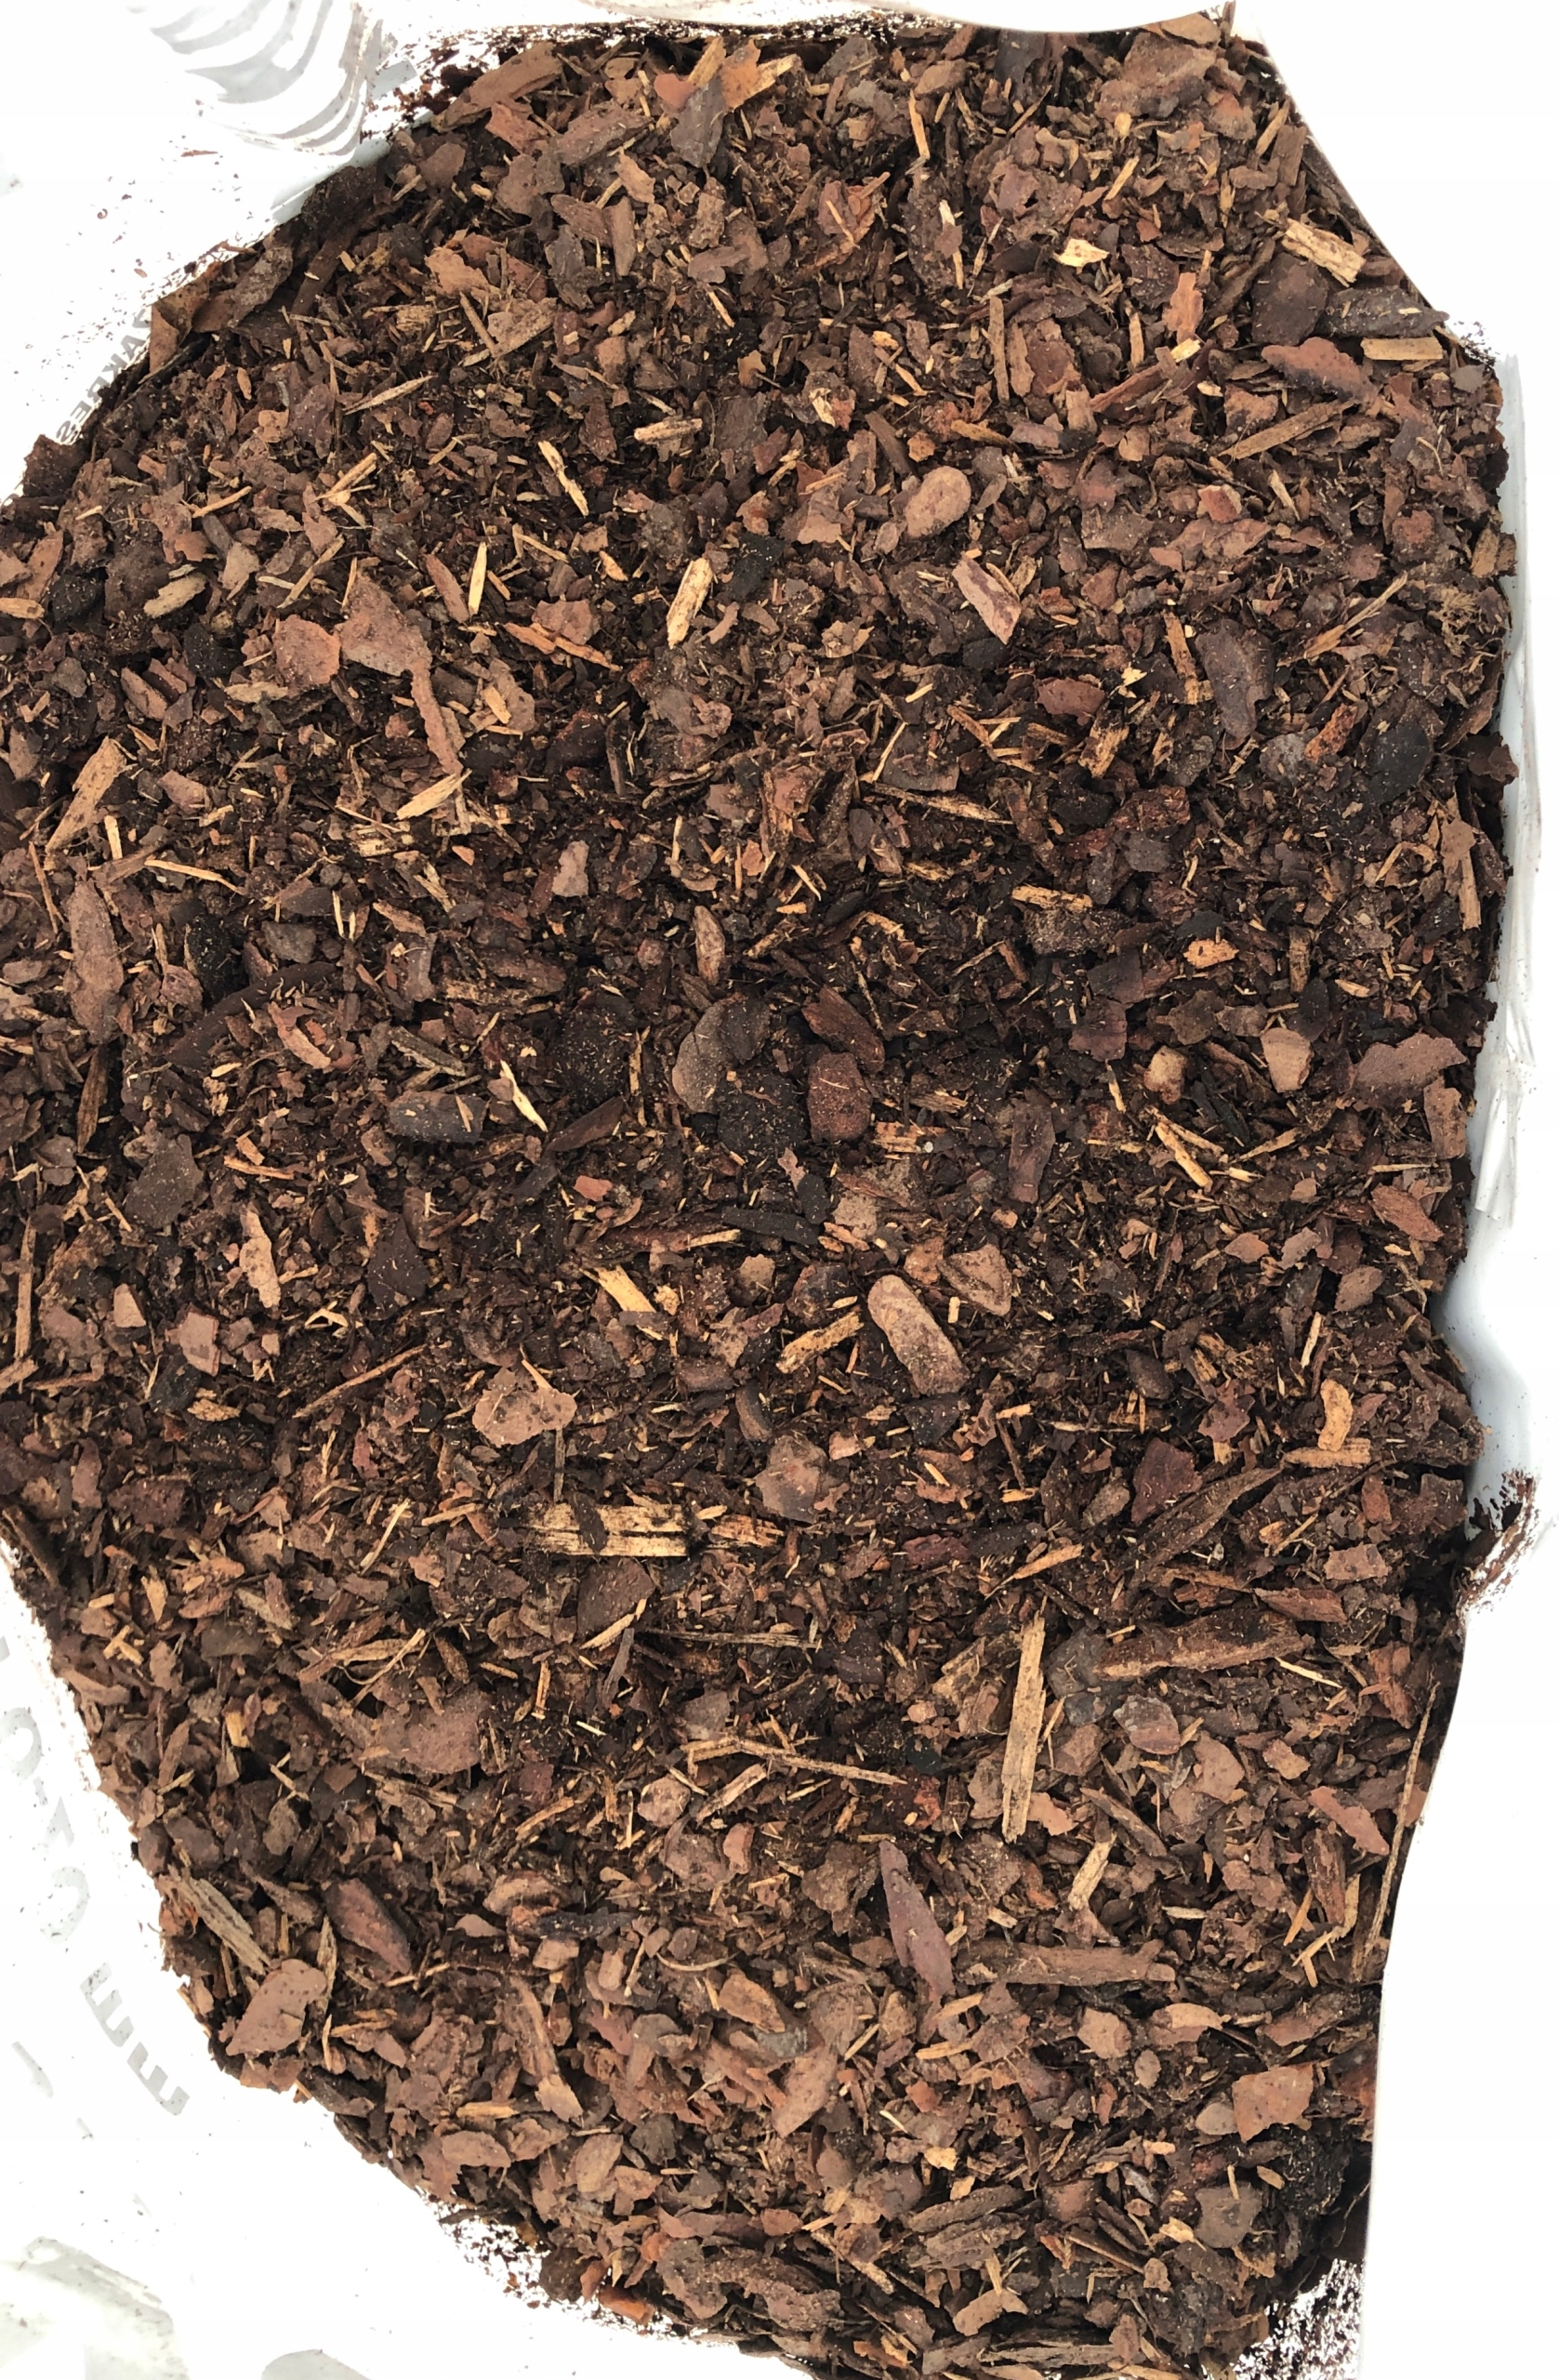 Kora kompostowana 0-20 mm DROBNA POD BORÓWKĘ